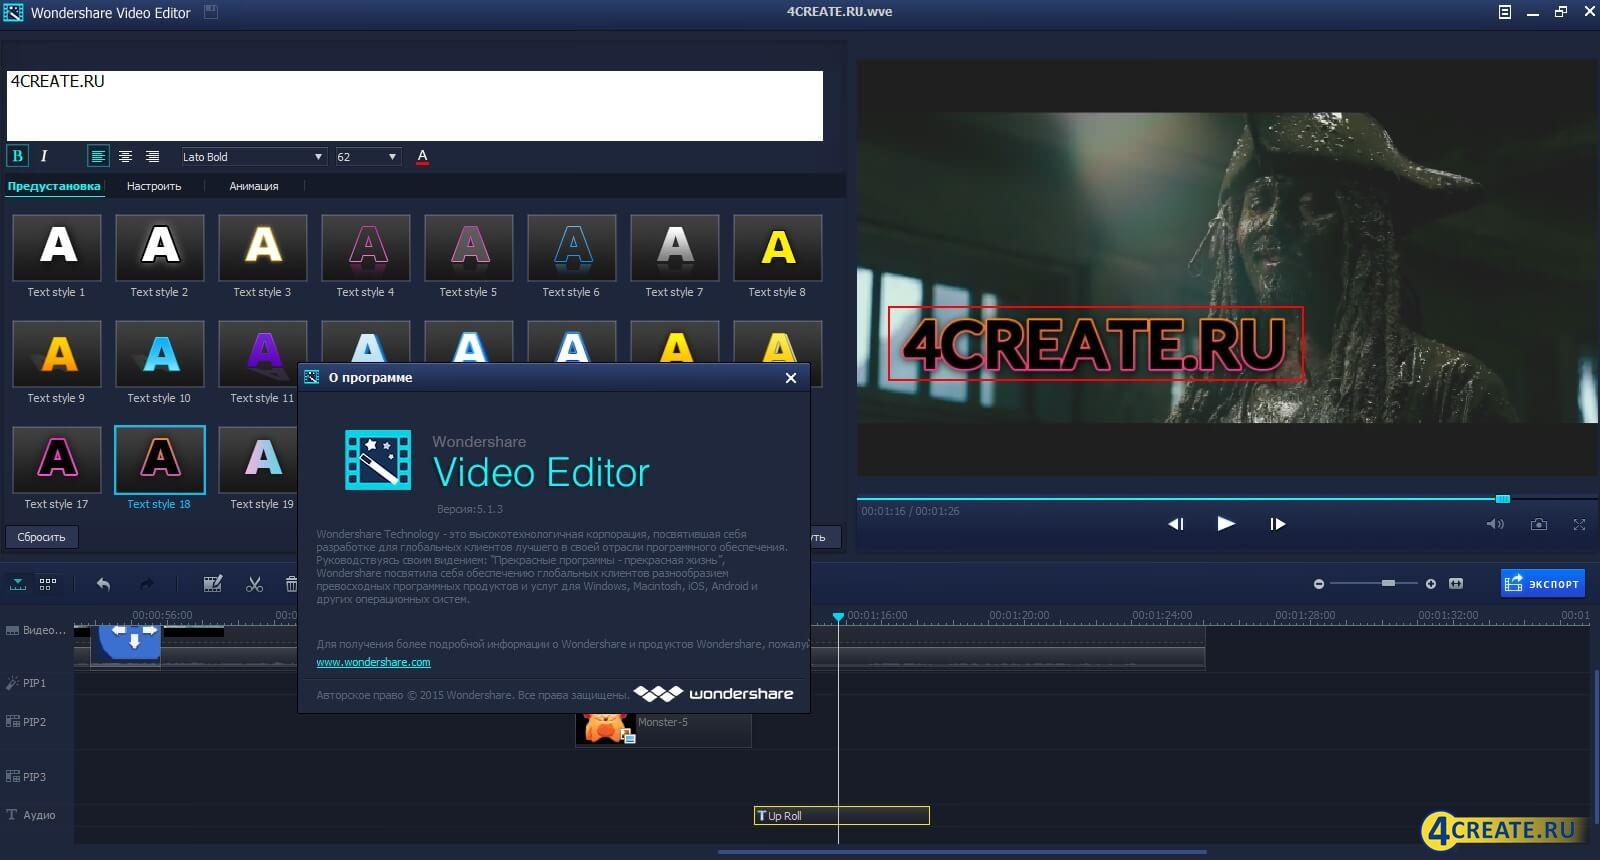 Wondershare Video Editor 5.1 (Скриншот 1)